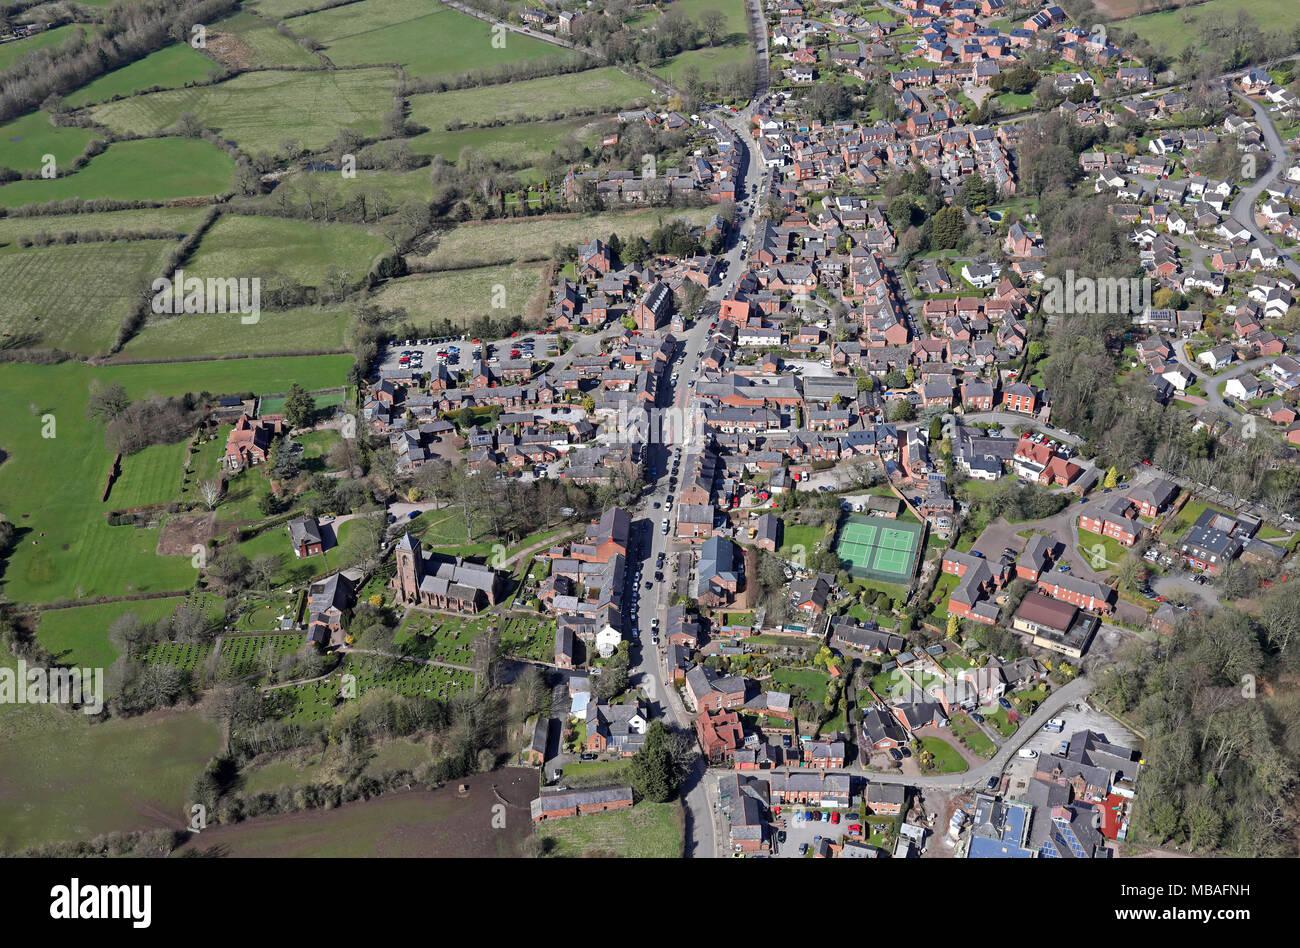 aerial view of Tarporley village in Cheshire, UK - Stock Image